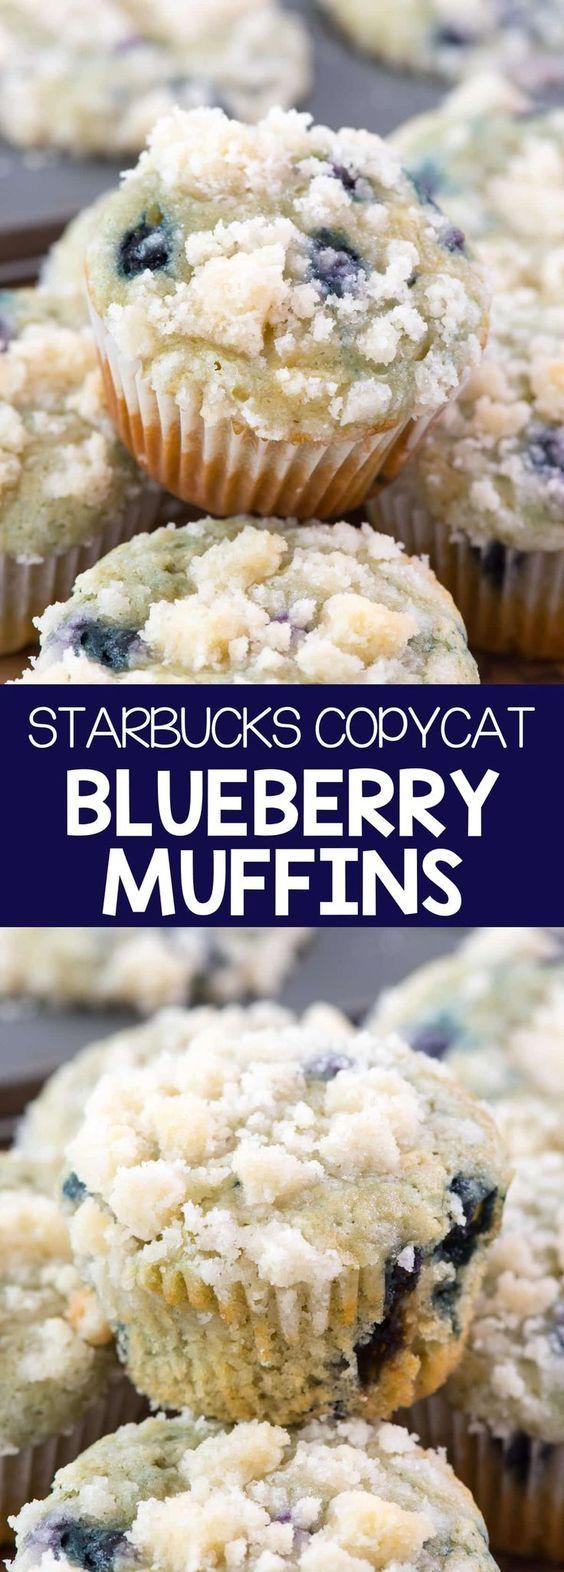 Starbucks Copycat Blueberry Muffins Recipe